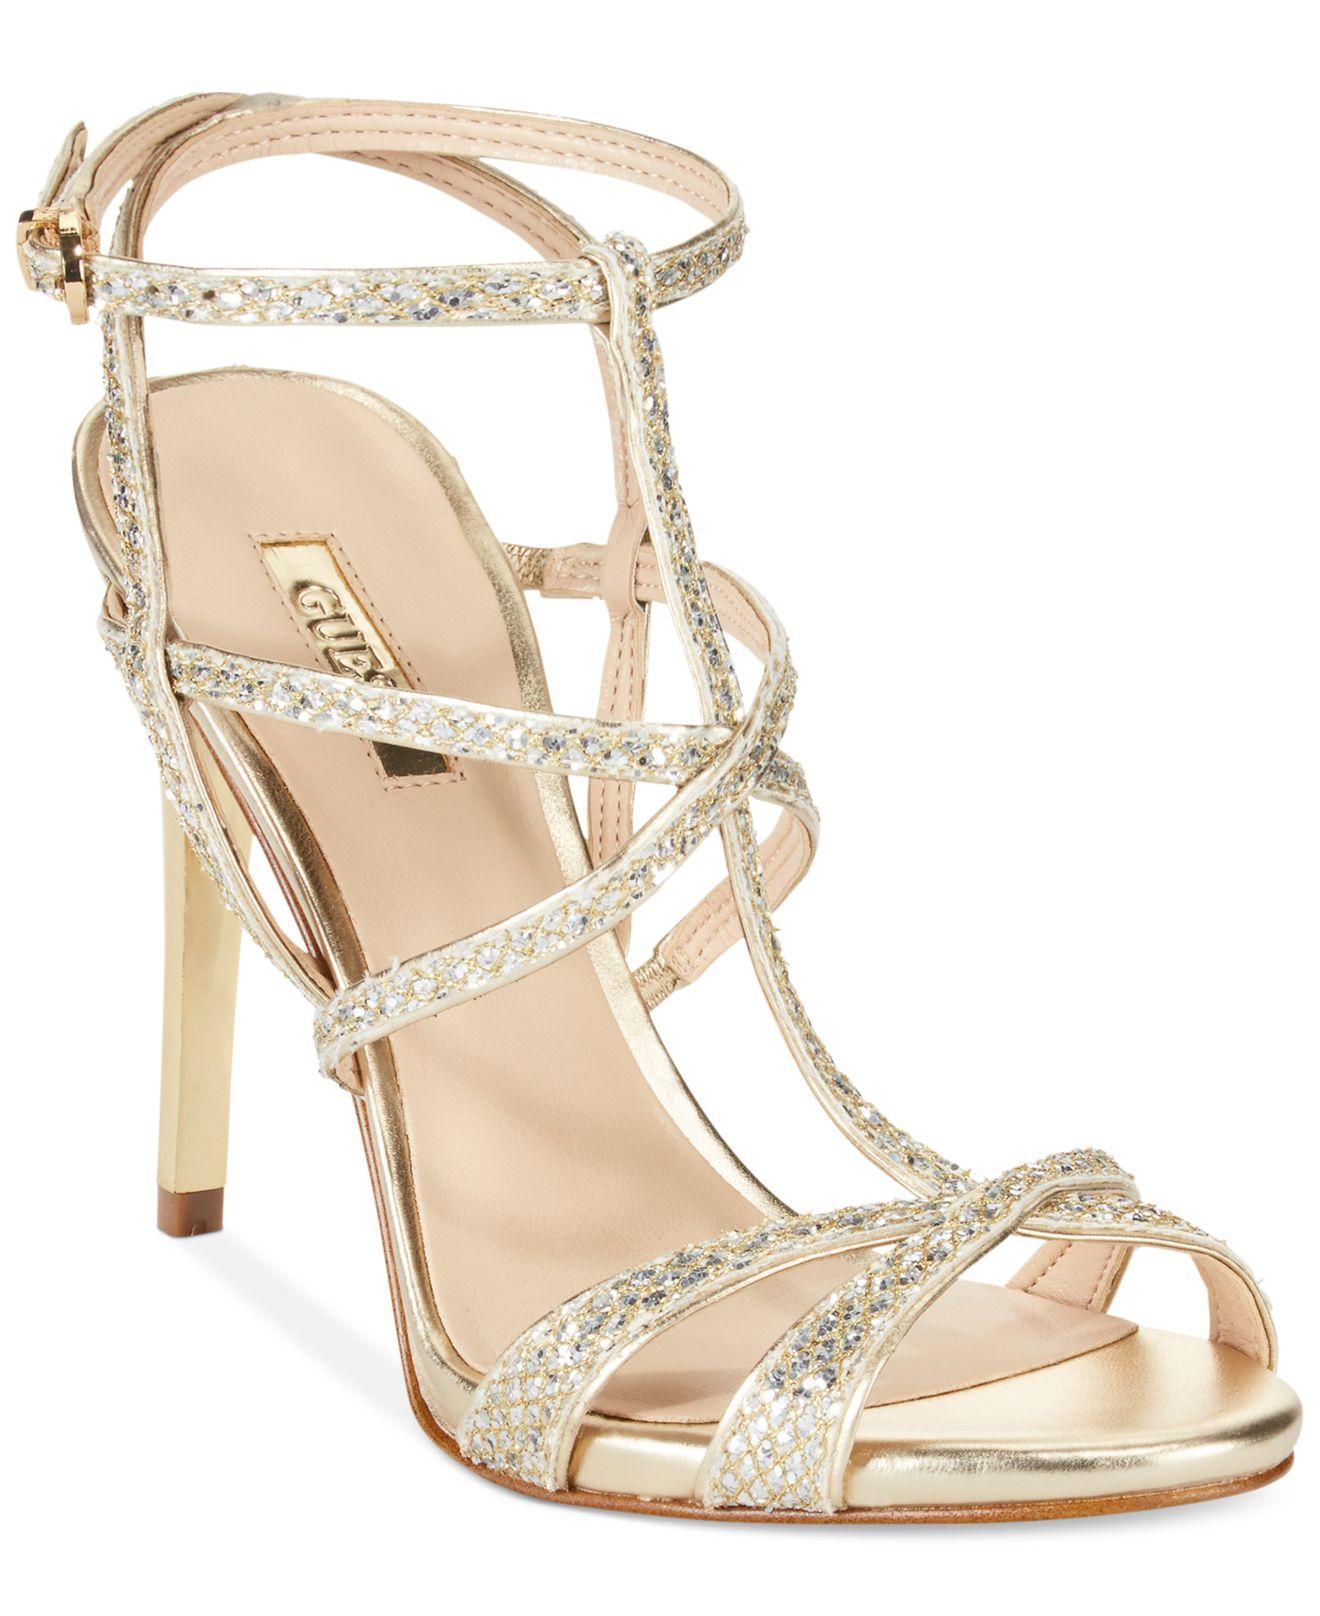 0673550a520175 Lyst - Guess Women s Carnneya Strappy T-strap Dress Sandals in Metallic